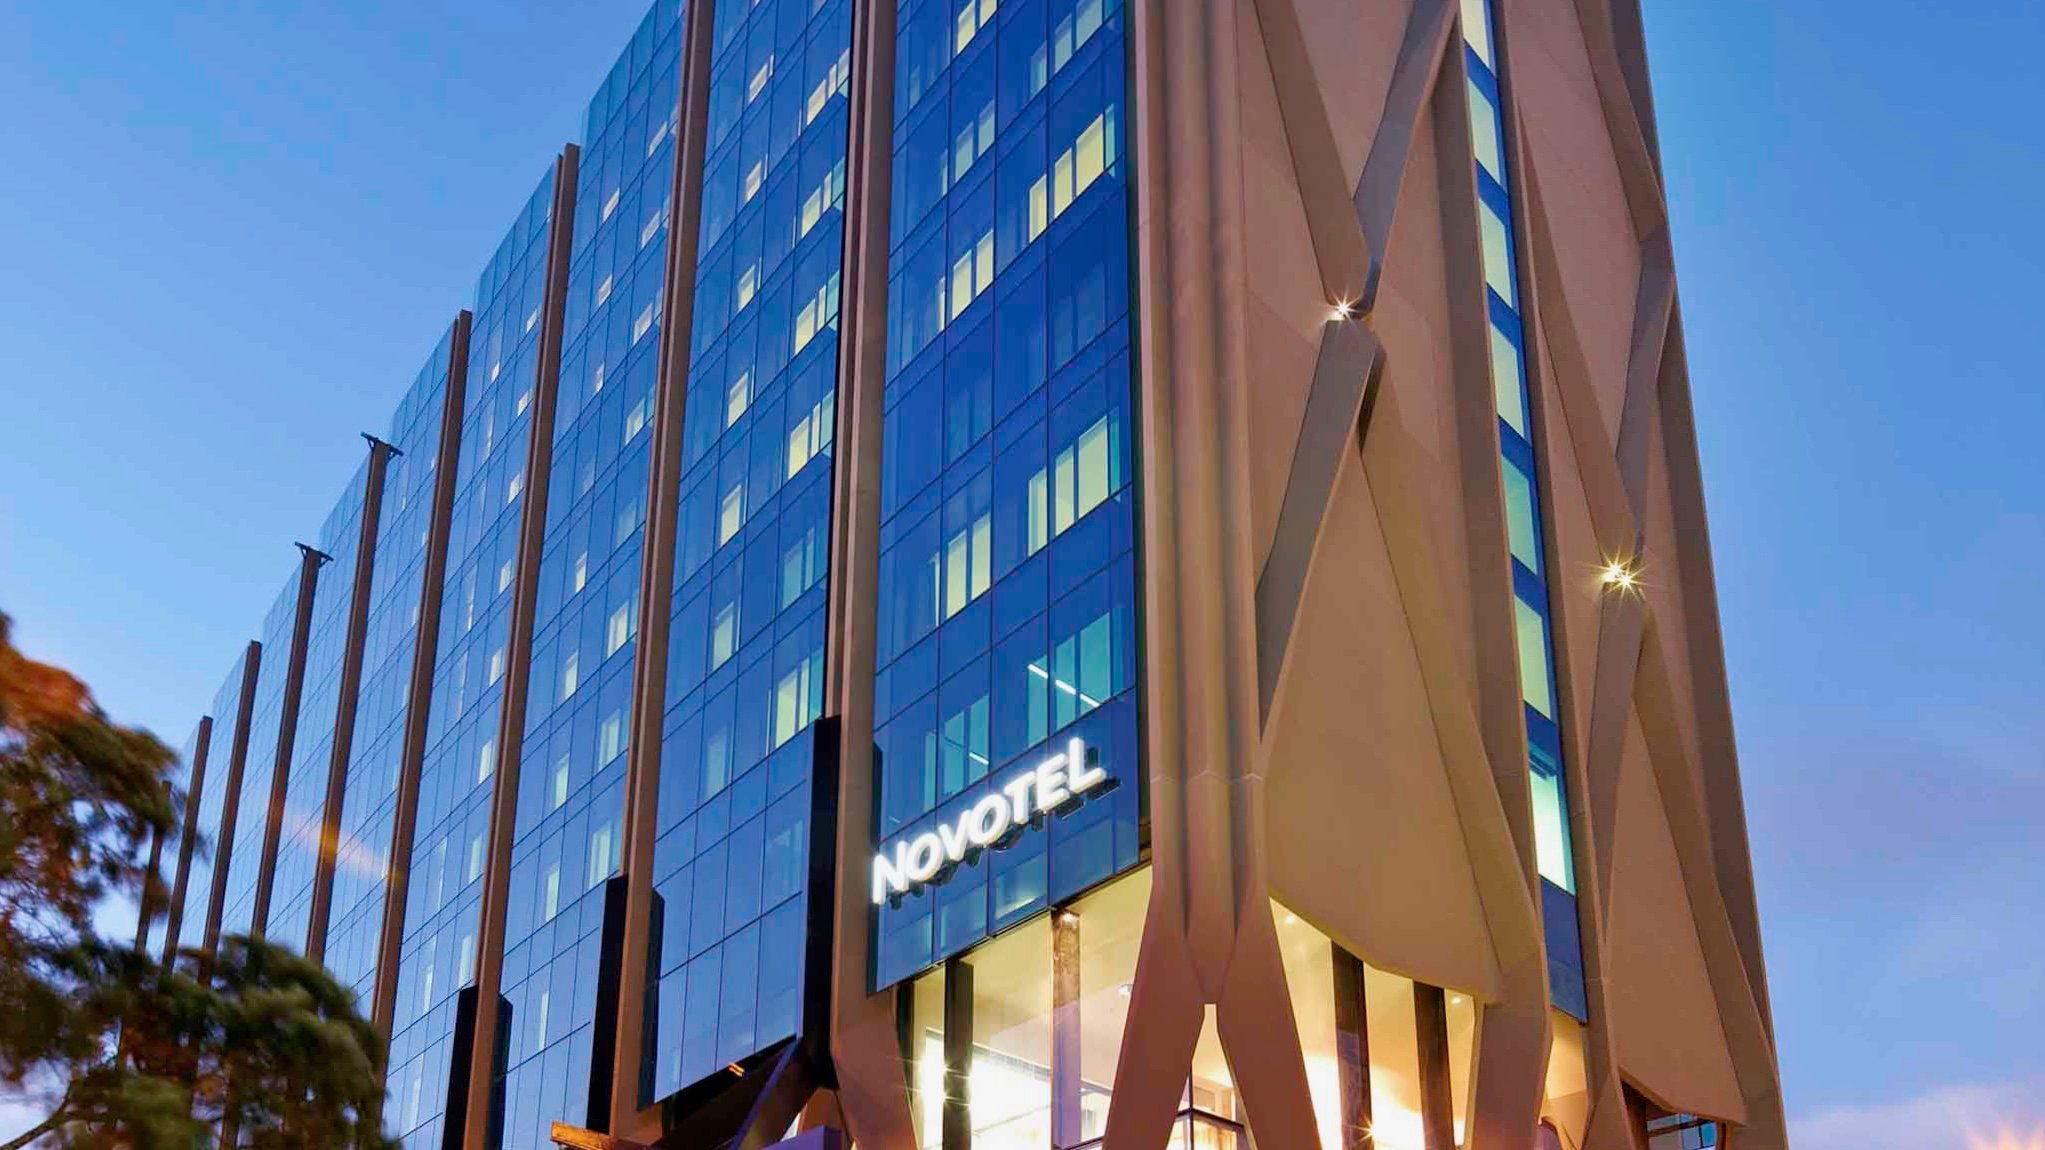 4 star Hotel Novotel Auckland Airport